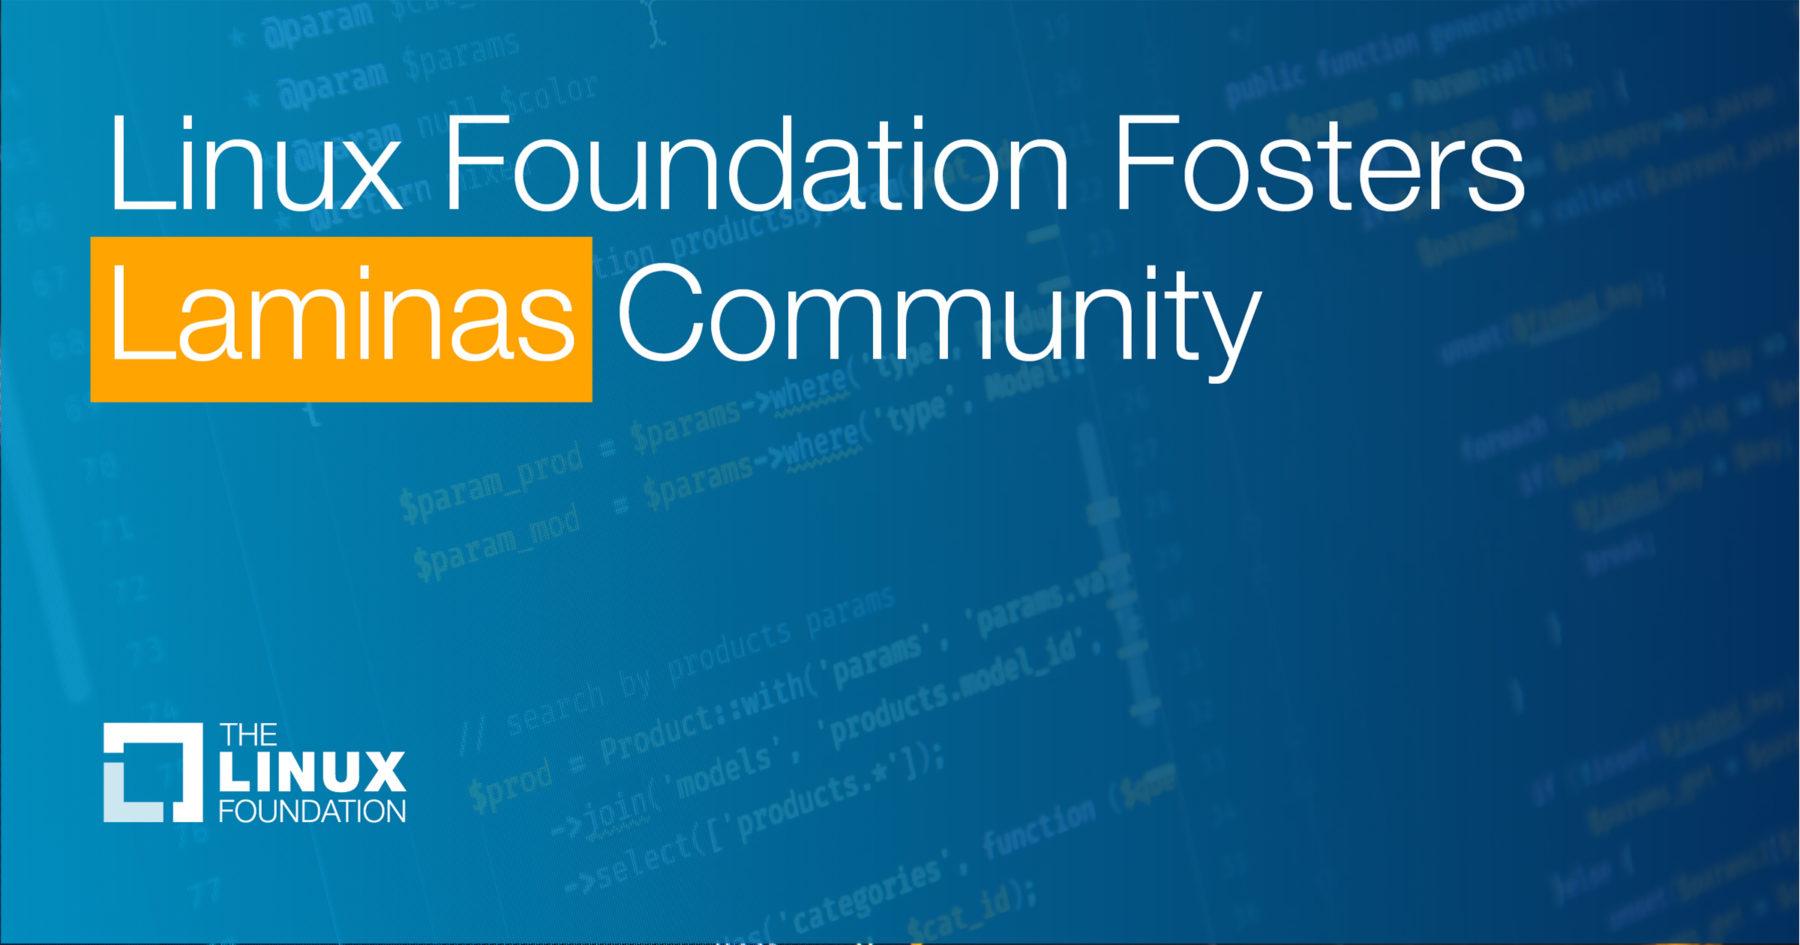 Linux Foundation Fosters Laminas Community